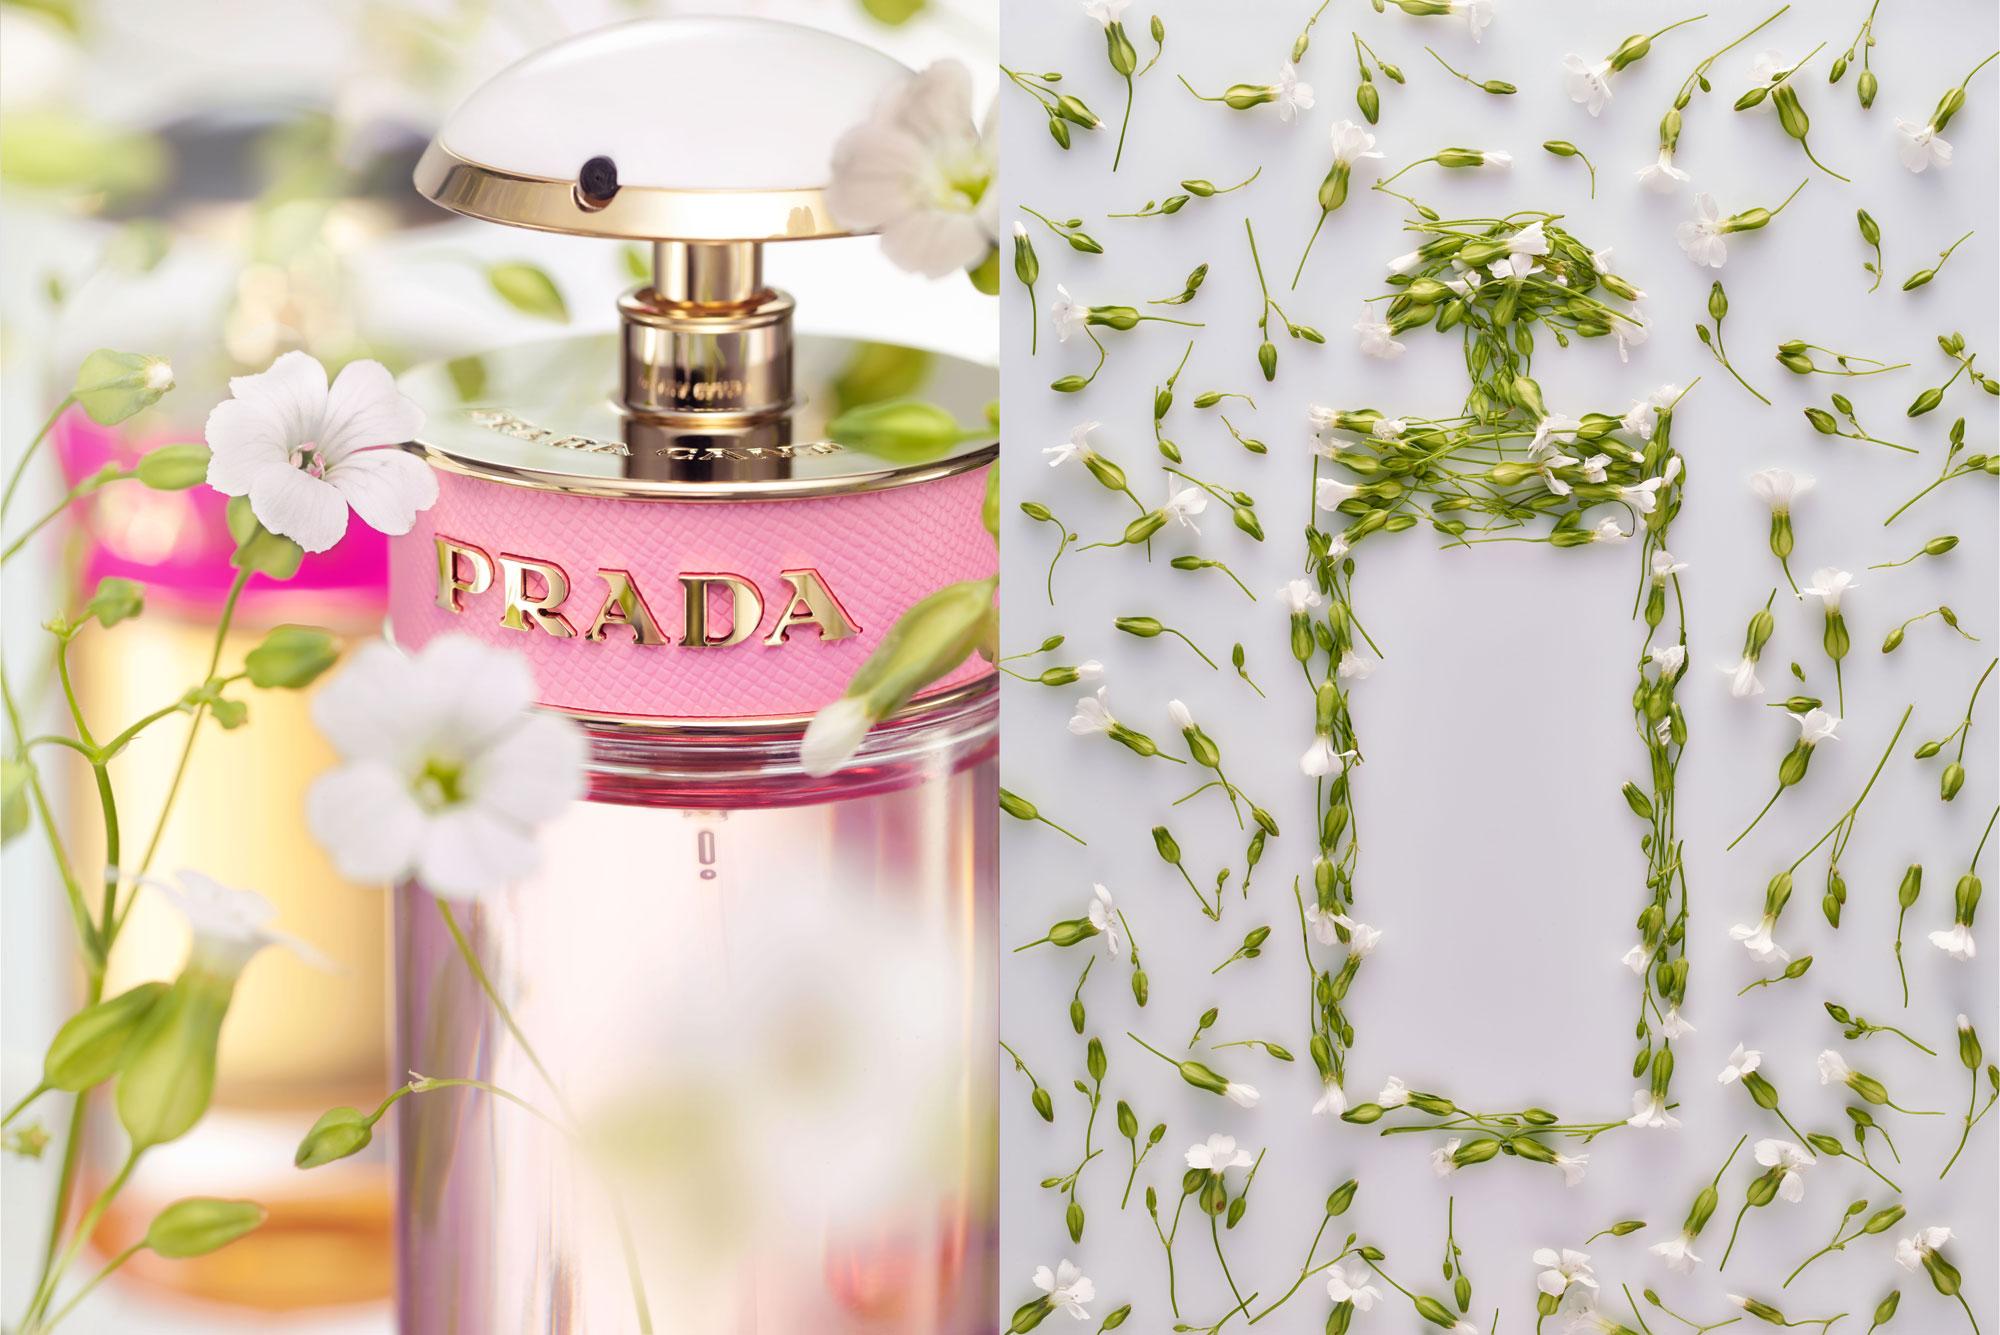 061016_flower_perfume_prada123464.jpg